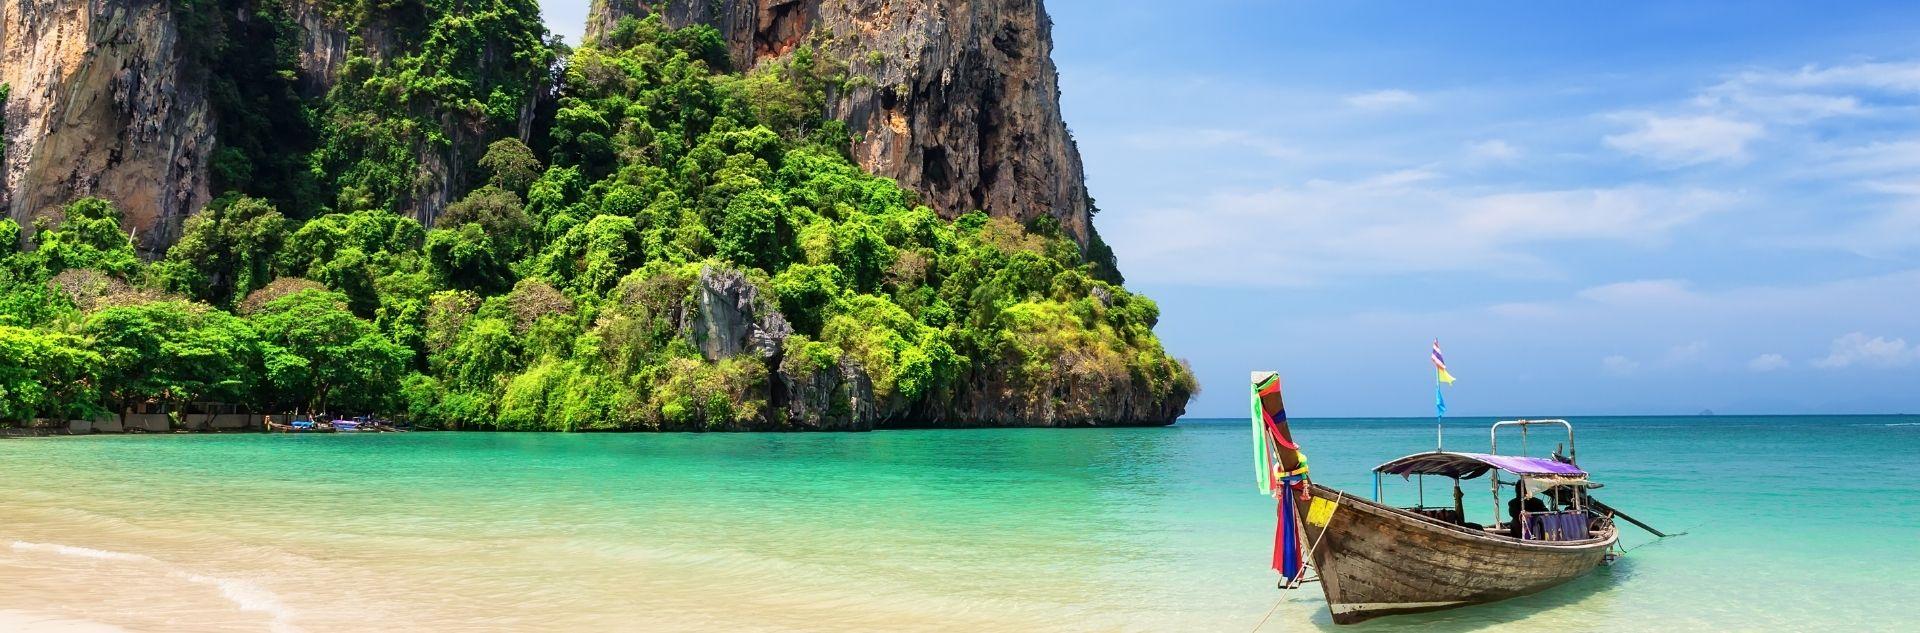 Fernreise Asien - Thailand Meer